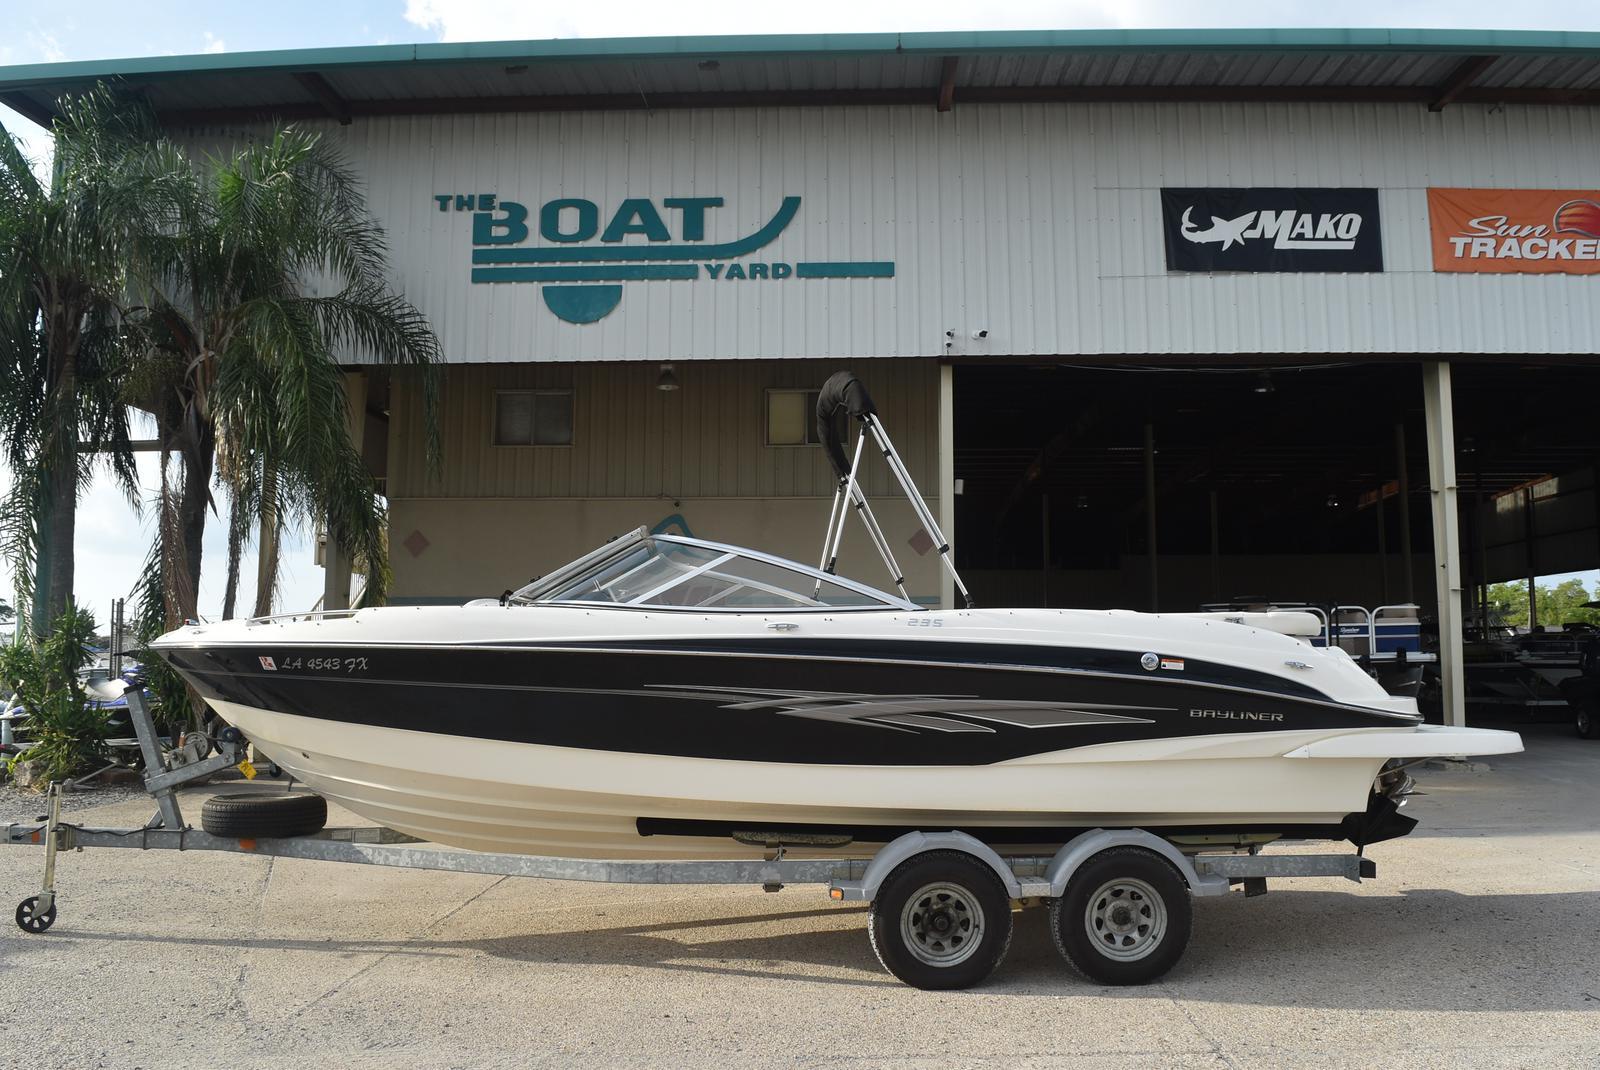 2010 Bayliner boat for sale, model of the boat is 235BR & Image # 37 of 43